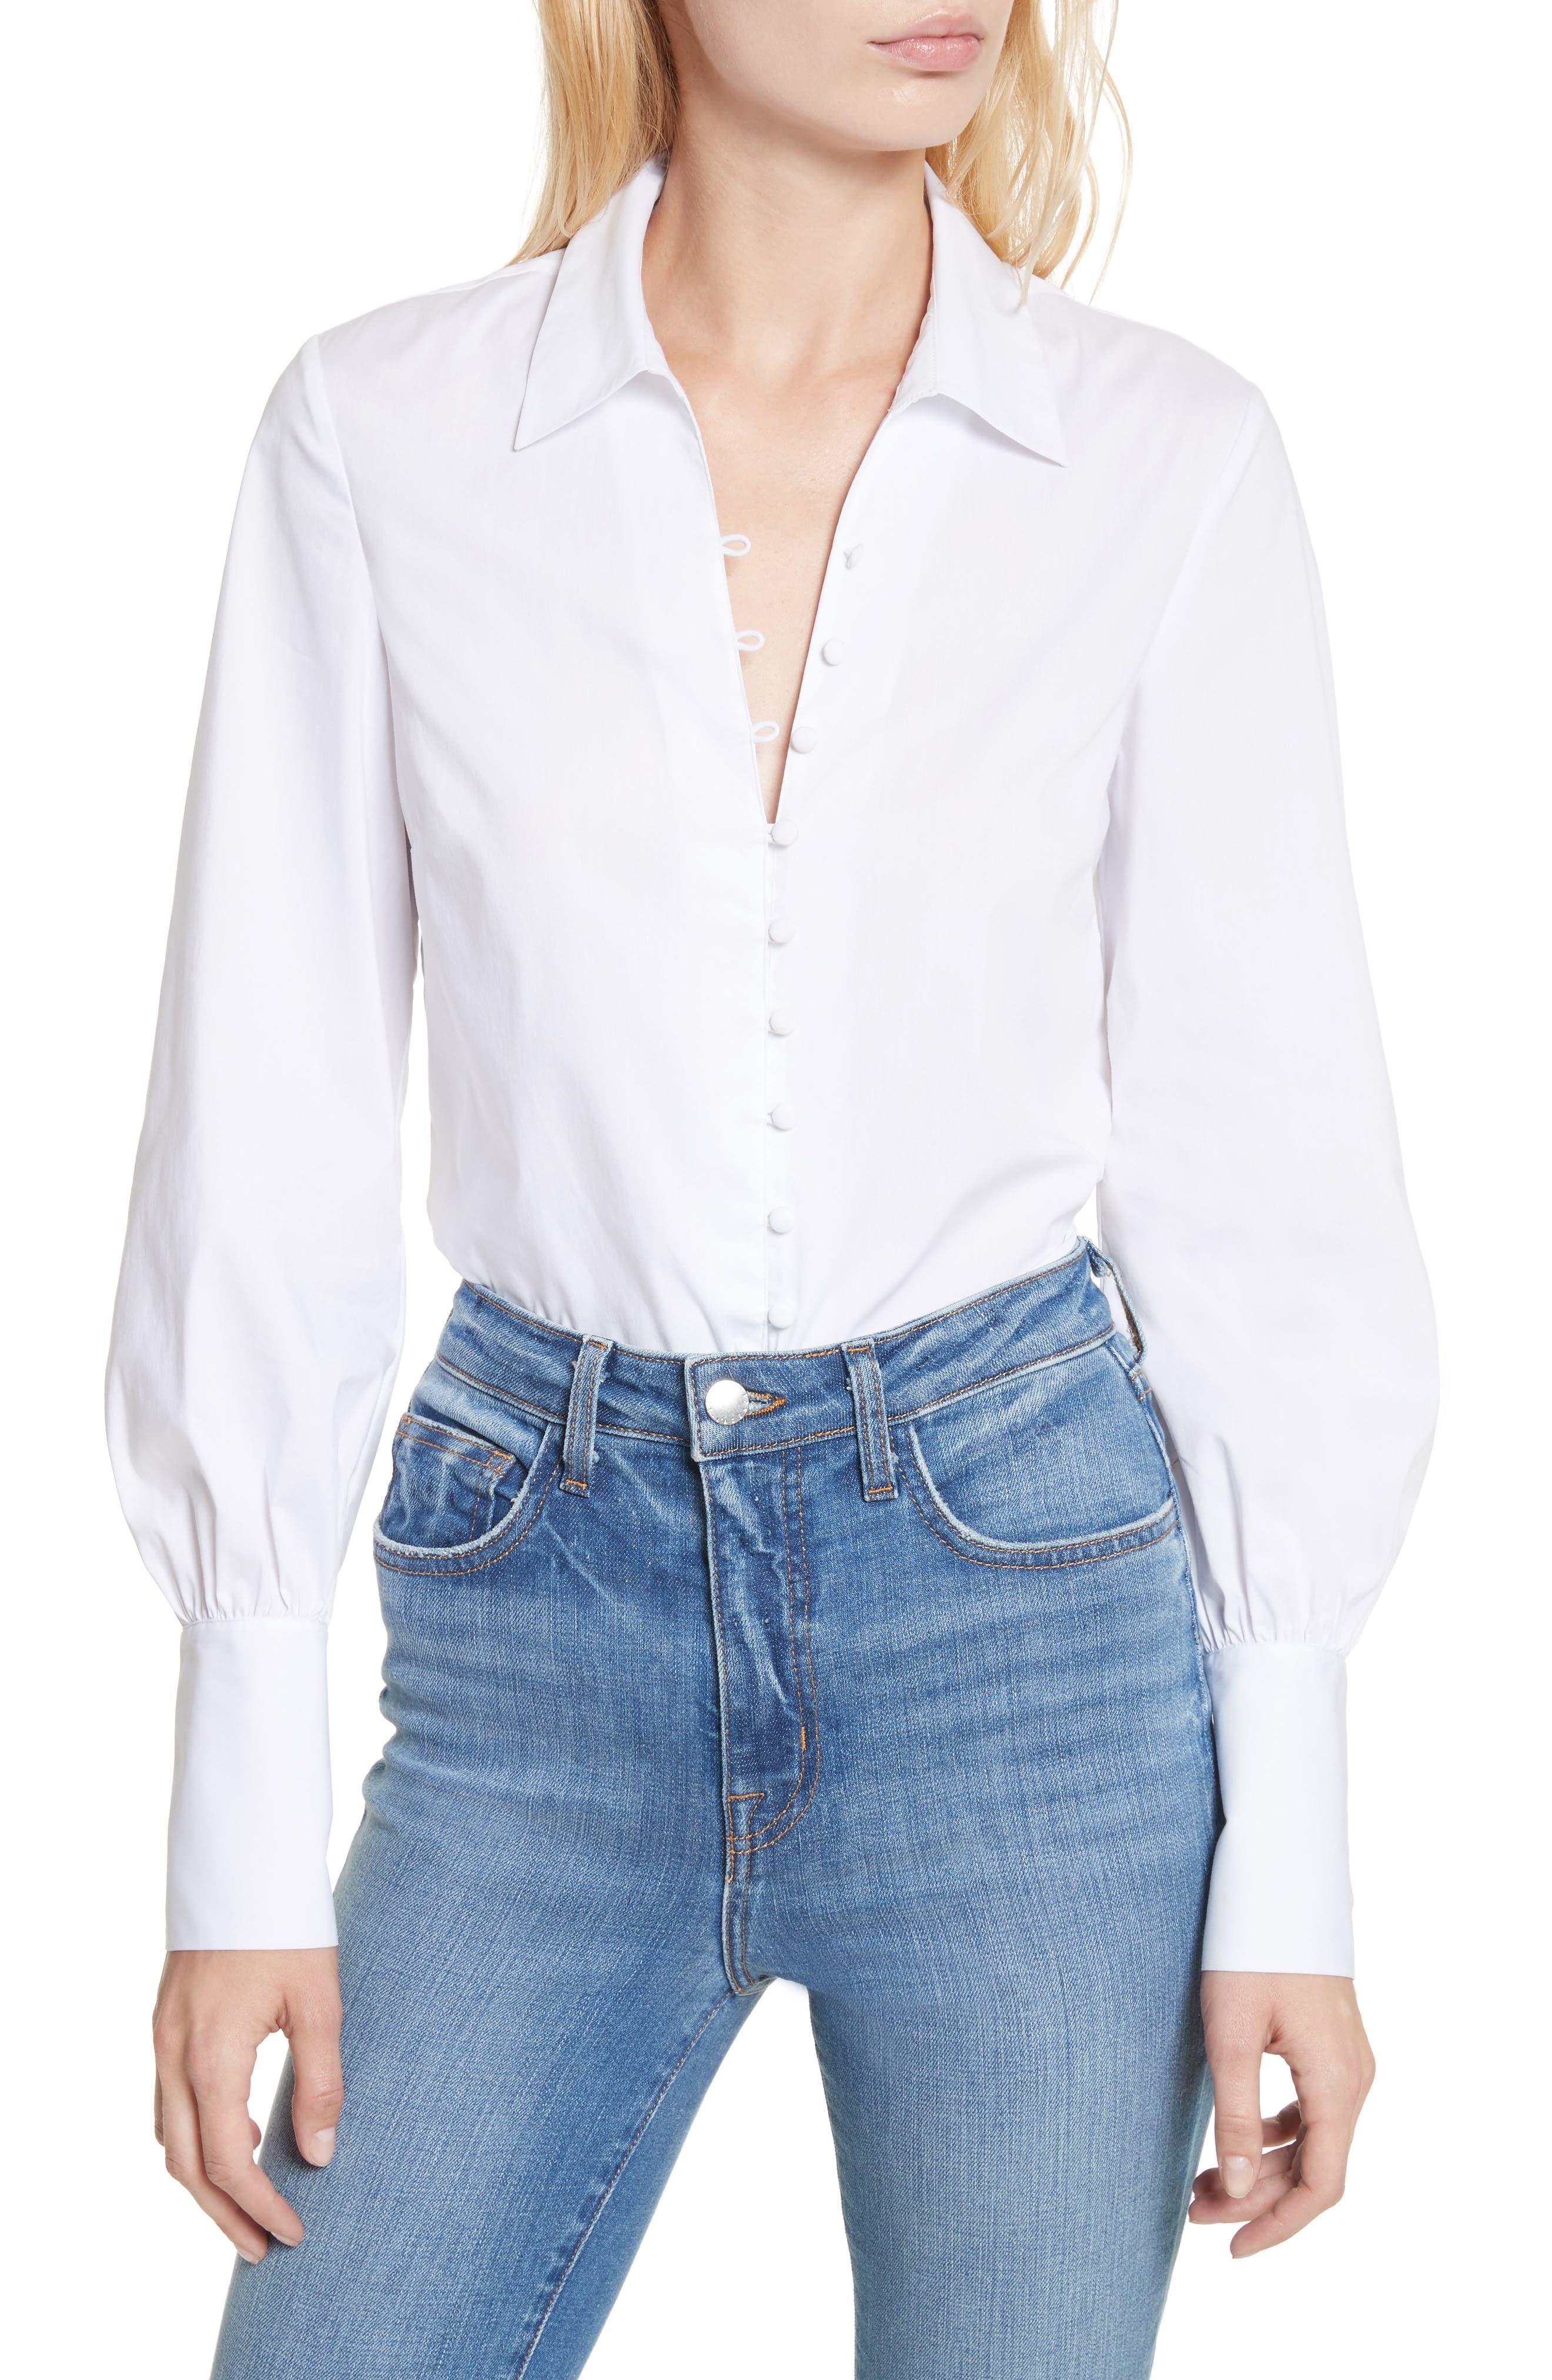 Main Image - L'AGENCE Puff Sleeve Shirt